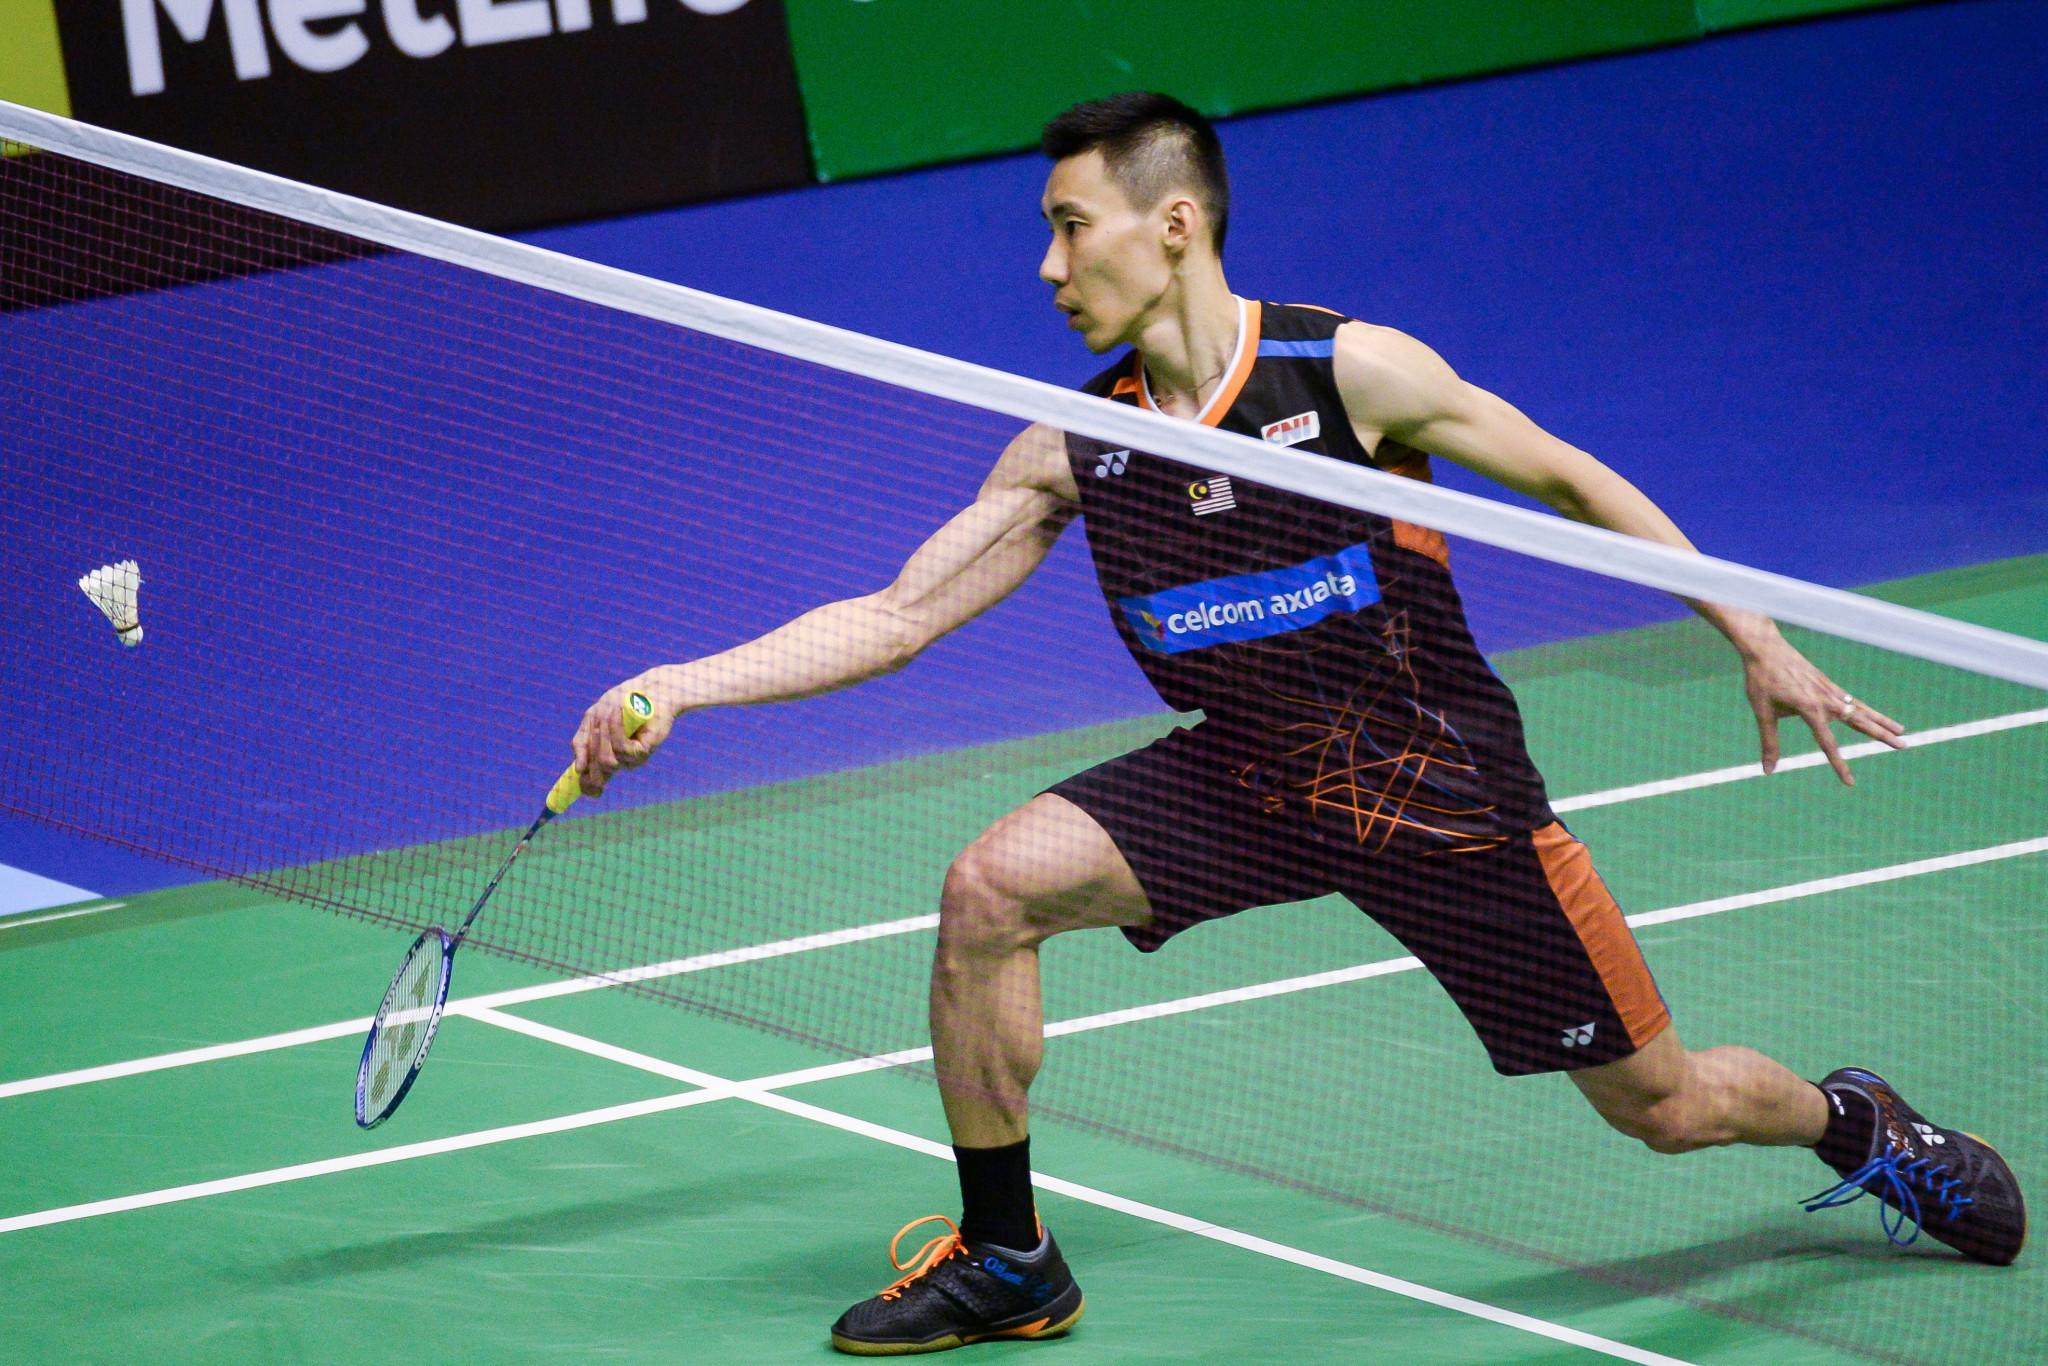 Lee Chong Wei wins record fifth Hong Kong Open title as upsets seedings